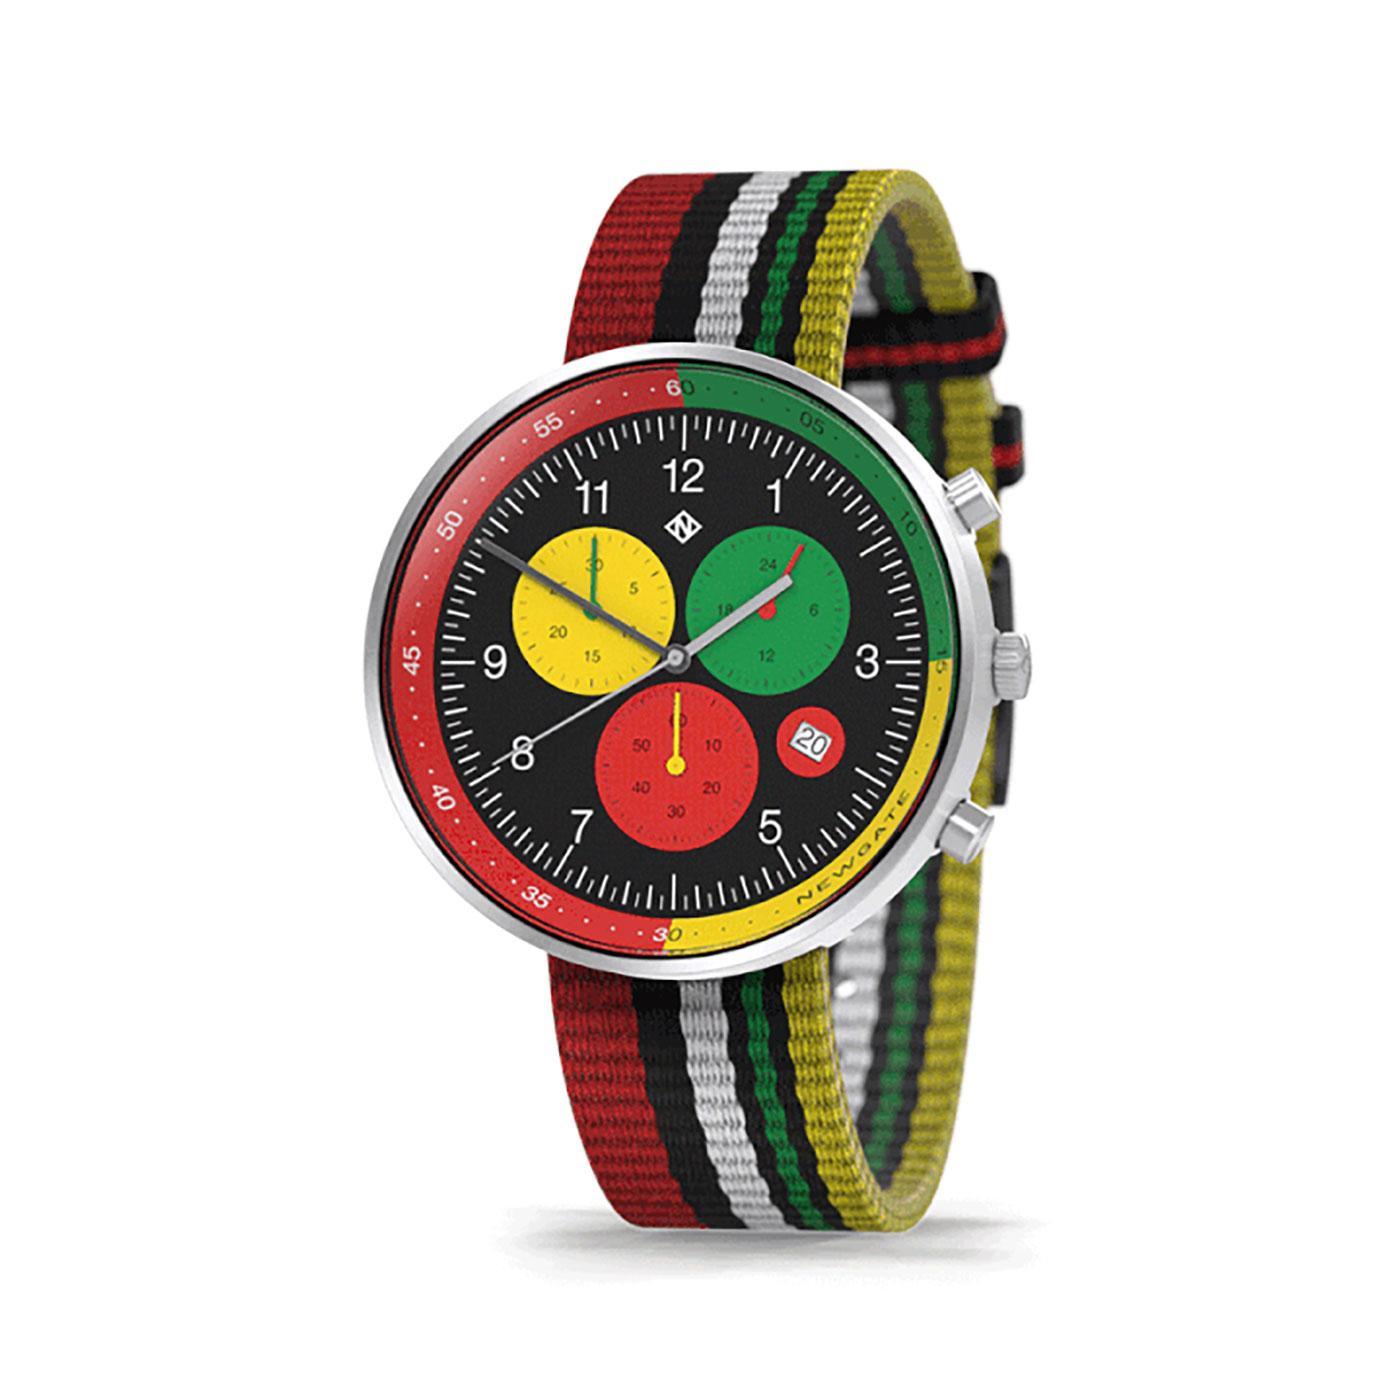 G6 Hong Kong NEWGATE CLOCKS Chronograph Watch